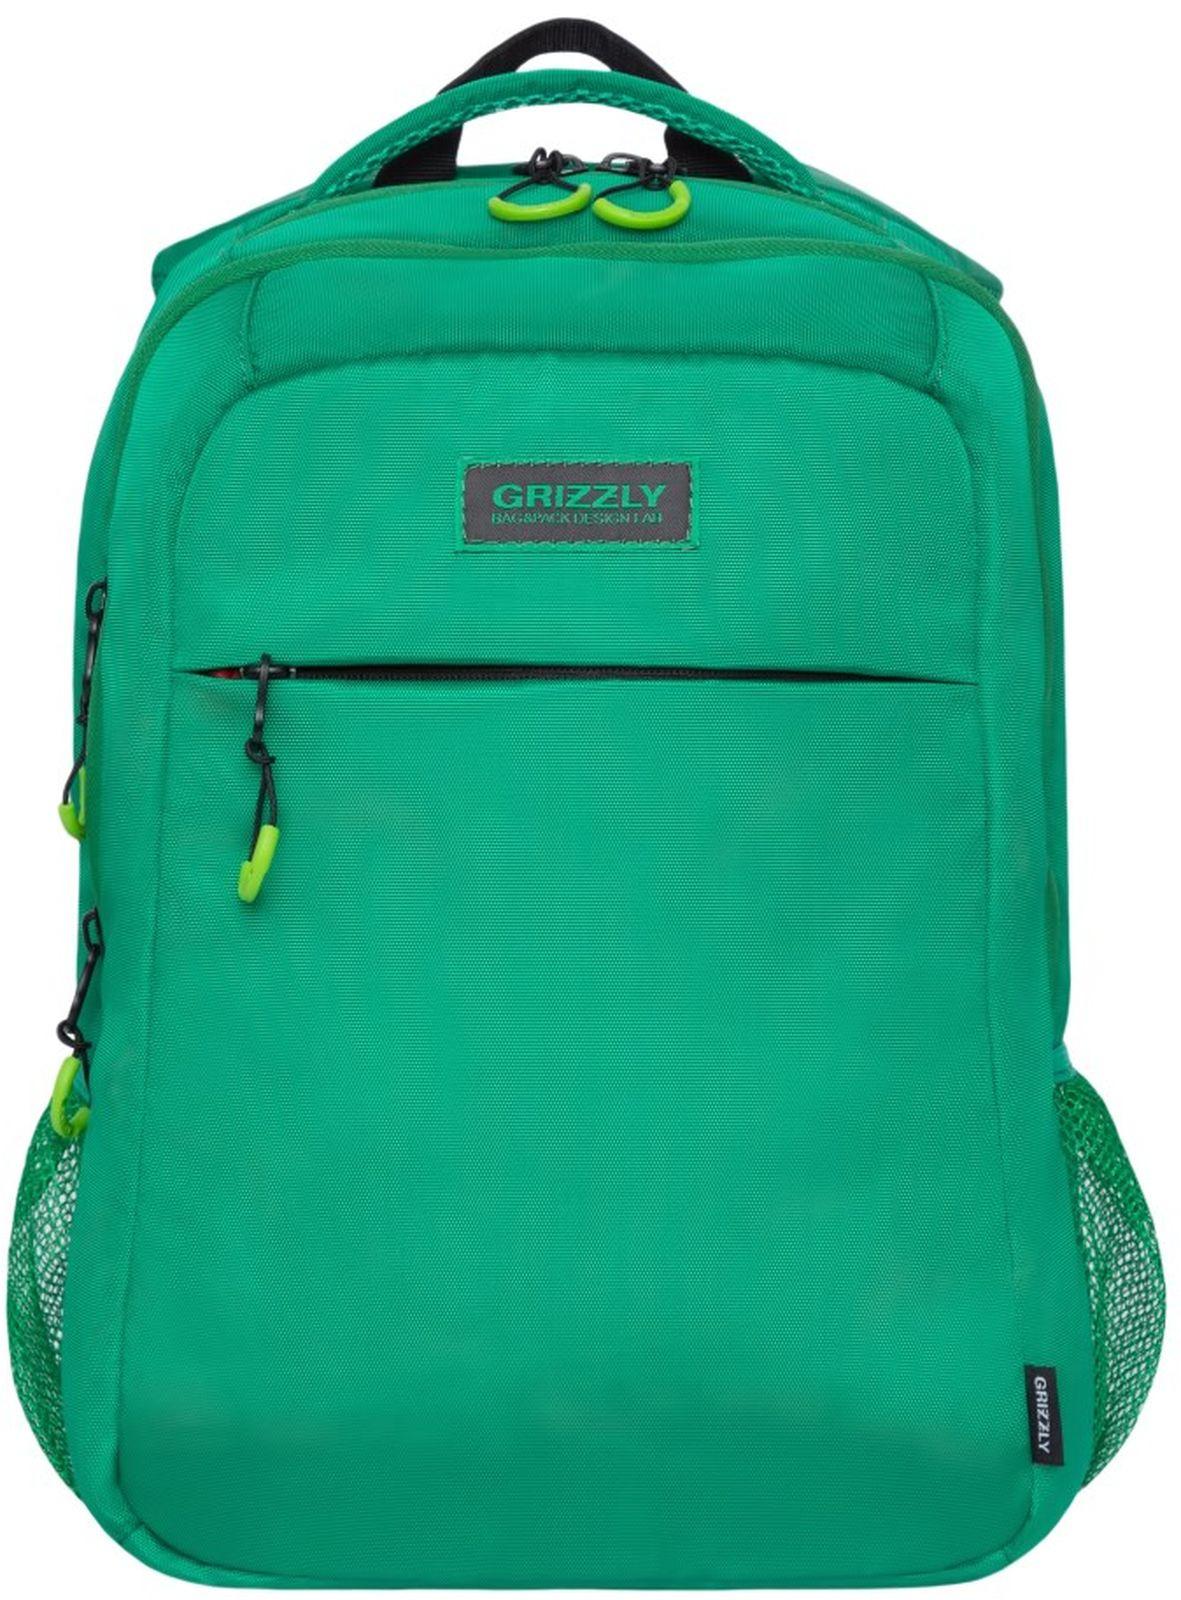 Рюкзак Grizzly, RU-933-2/3, зеленый рюкзак молодежный grizzly 16 л ru 808 2 2